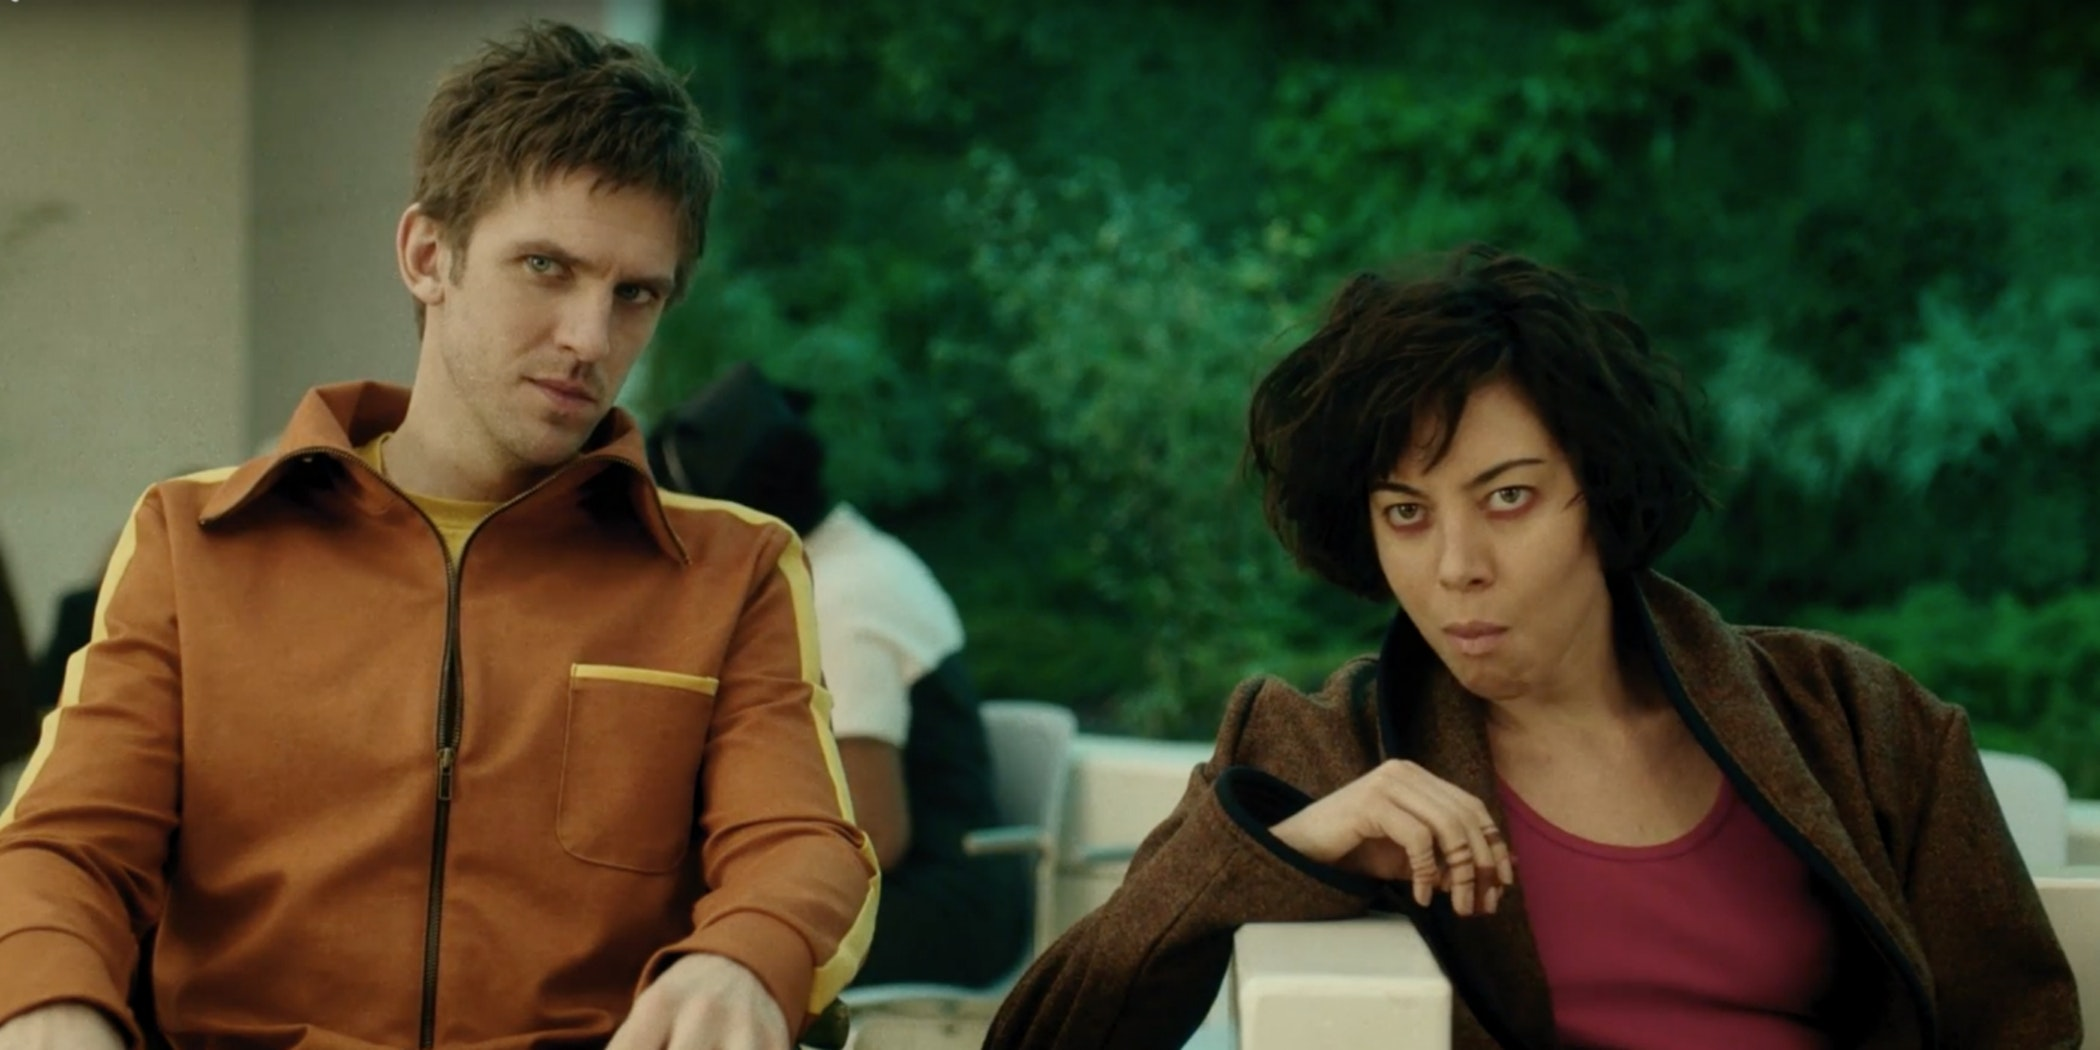 screencap from FX's 'Legion' X-Men TV series